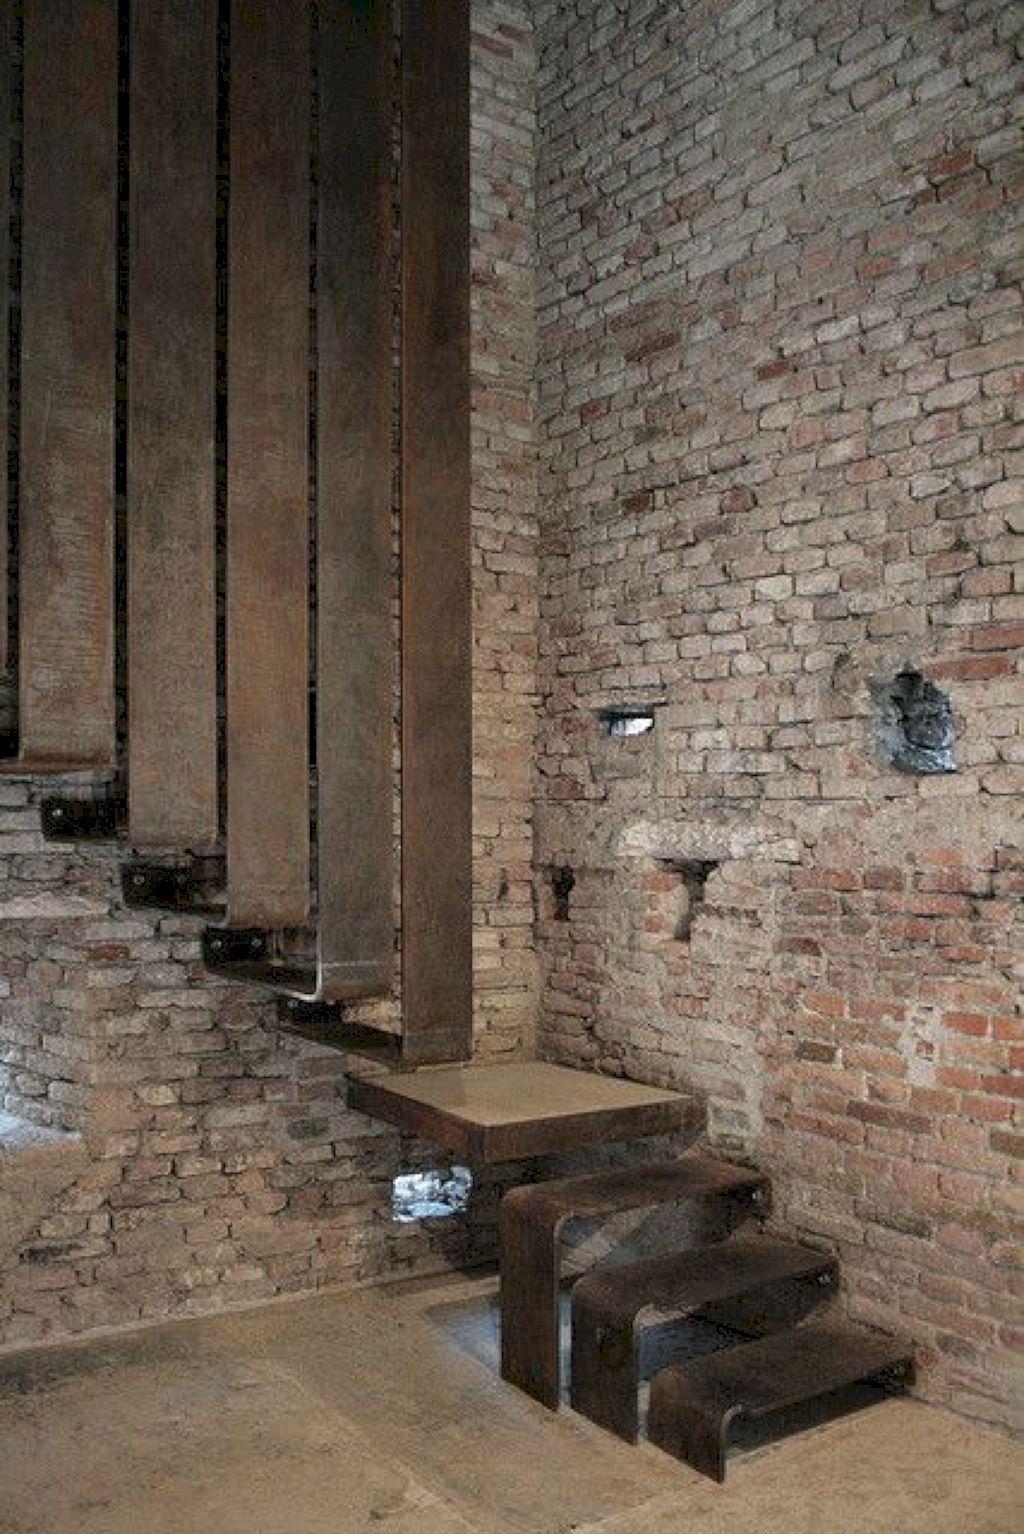 Best Pin By Elijah Wheat On Revit Stuido Ideas Rustic Stairs 400 x 300